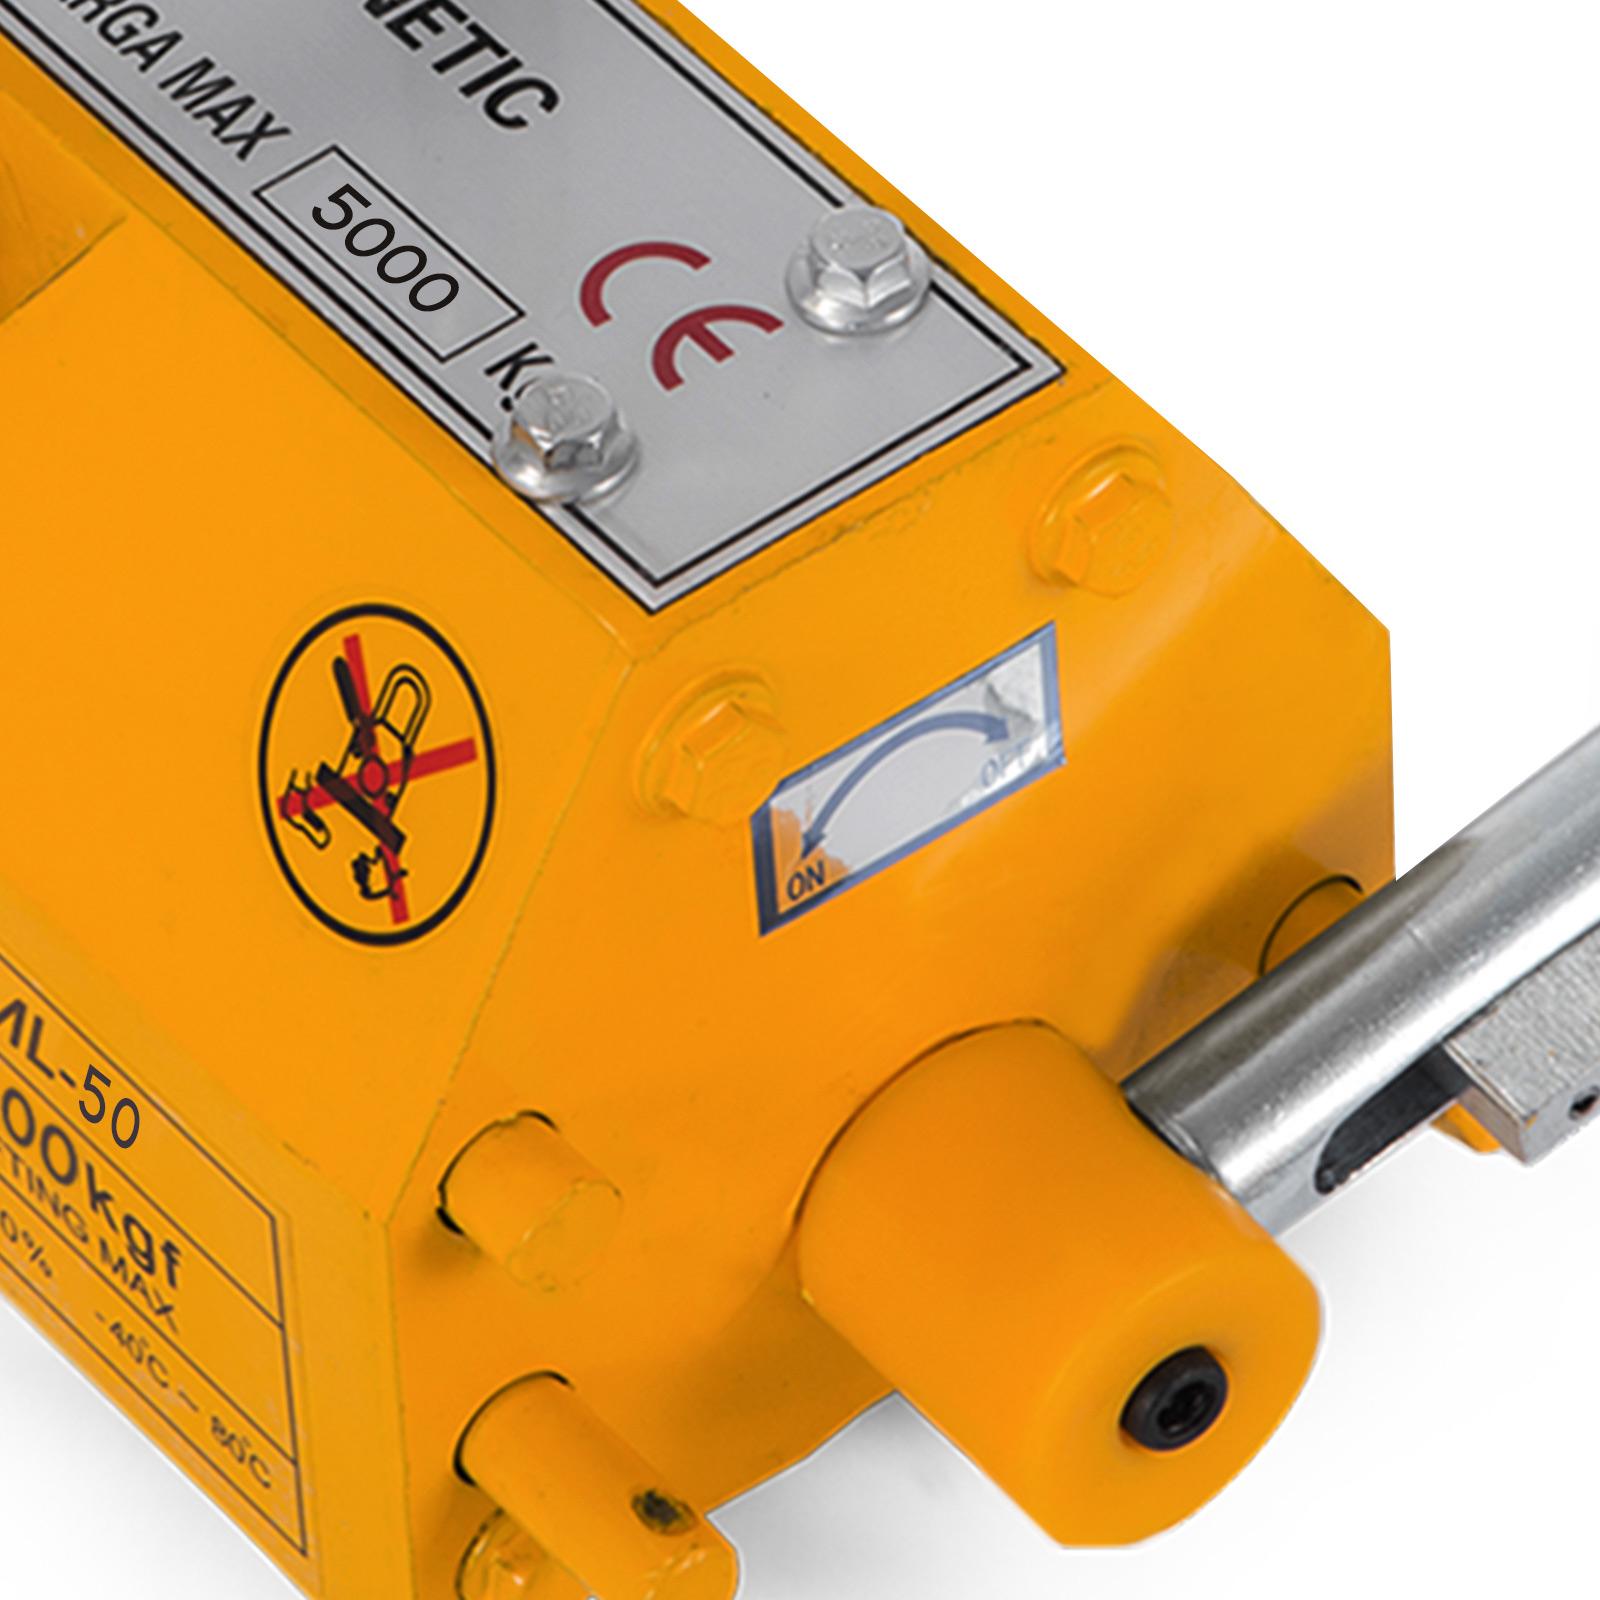 100-300-600-1000KG-Steel-Magnetic-Lifter-Heavy-Duty-Crane-Hoist-Lifting-Magnet miniature 116